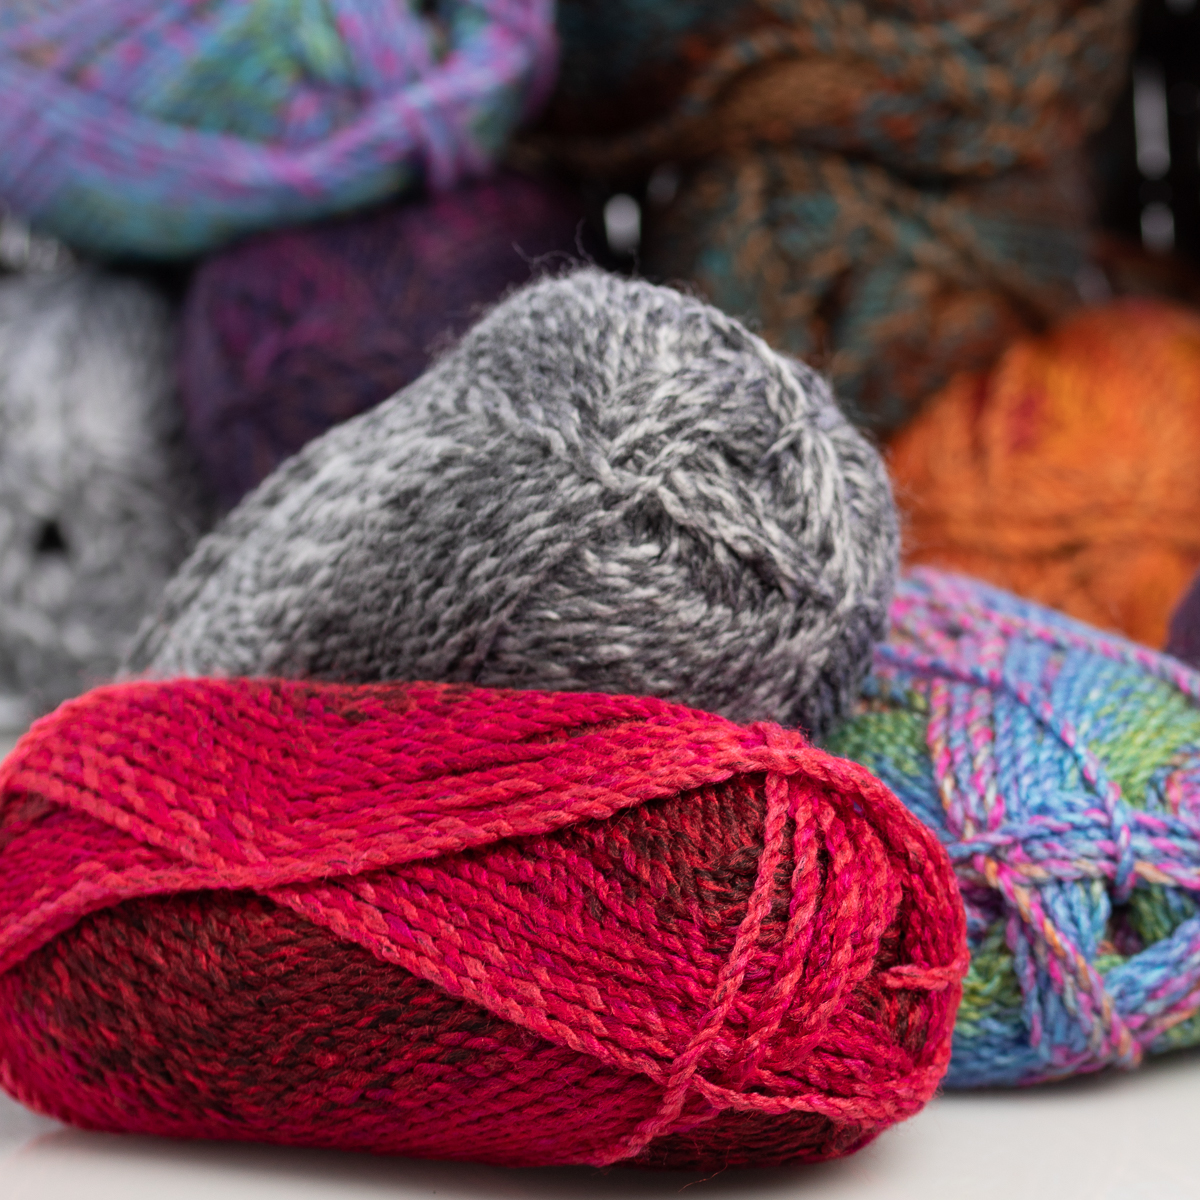 3pk-Lion-Brand-Yarn-100-Acrylic-Chunky-Yarn-Bulky-5-Soft-Knitting-Crocheting thumbnail 15